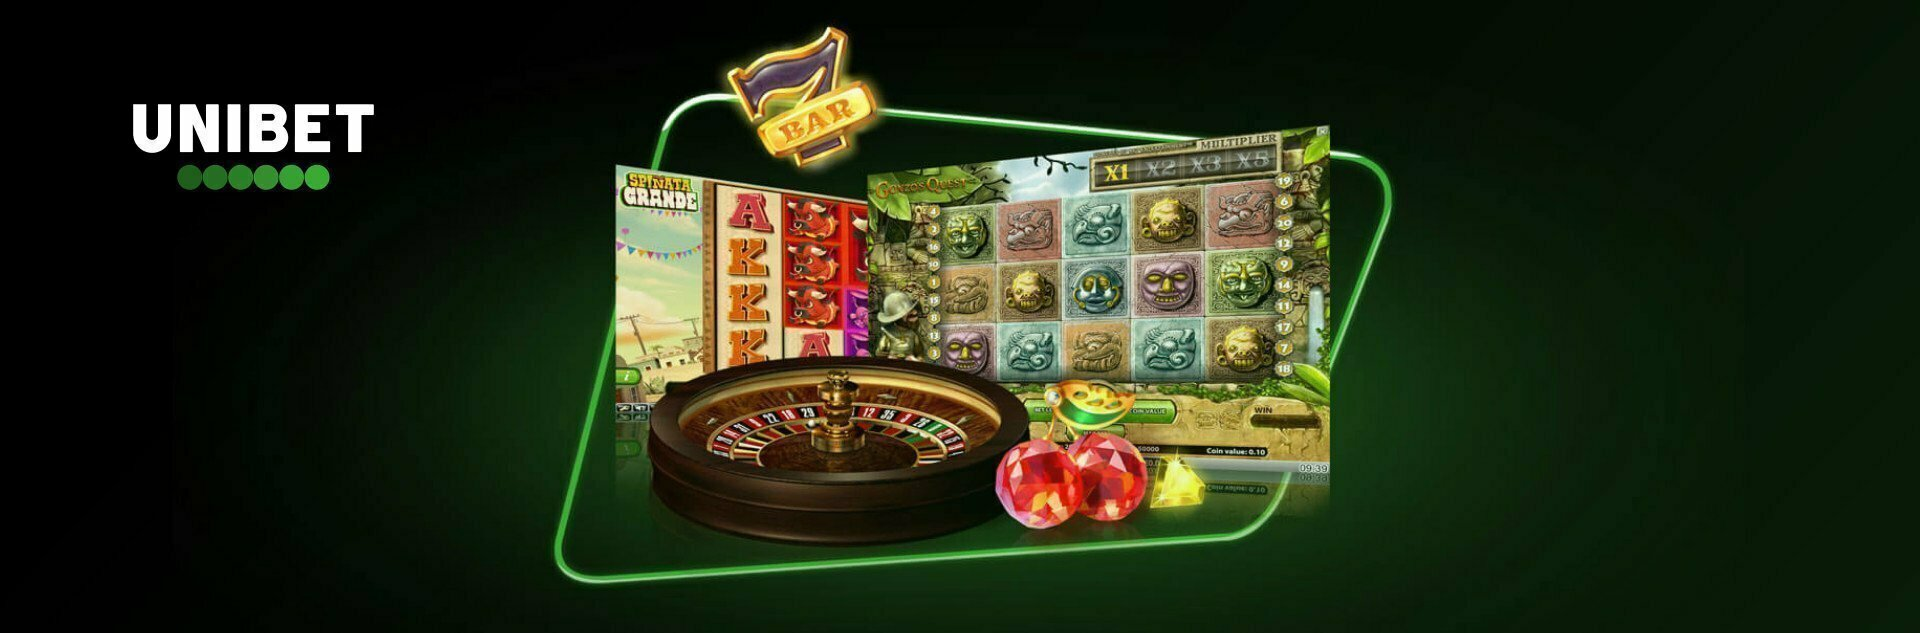 Unibet casino review US